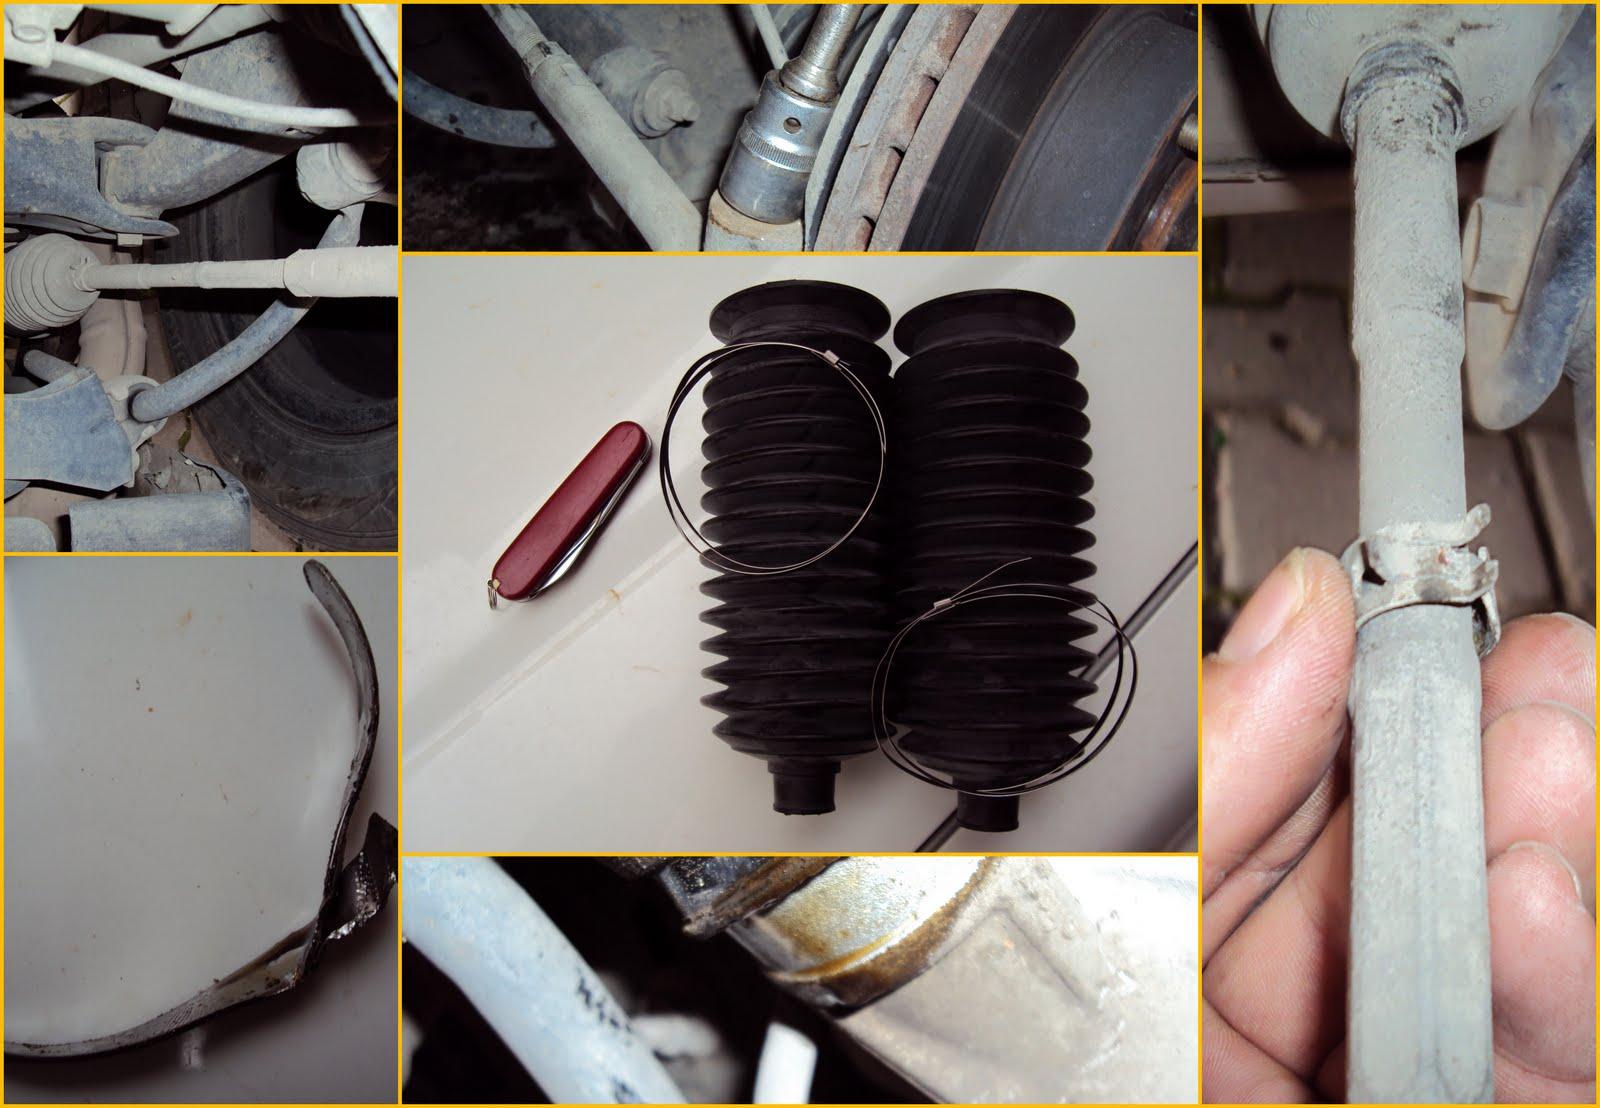 Fatih S Weblog Diy Subaru Forester Steering Rack Boot